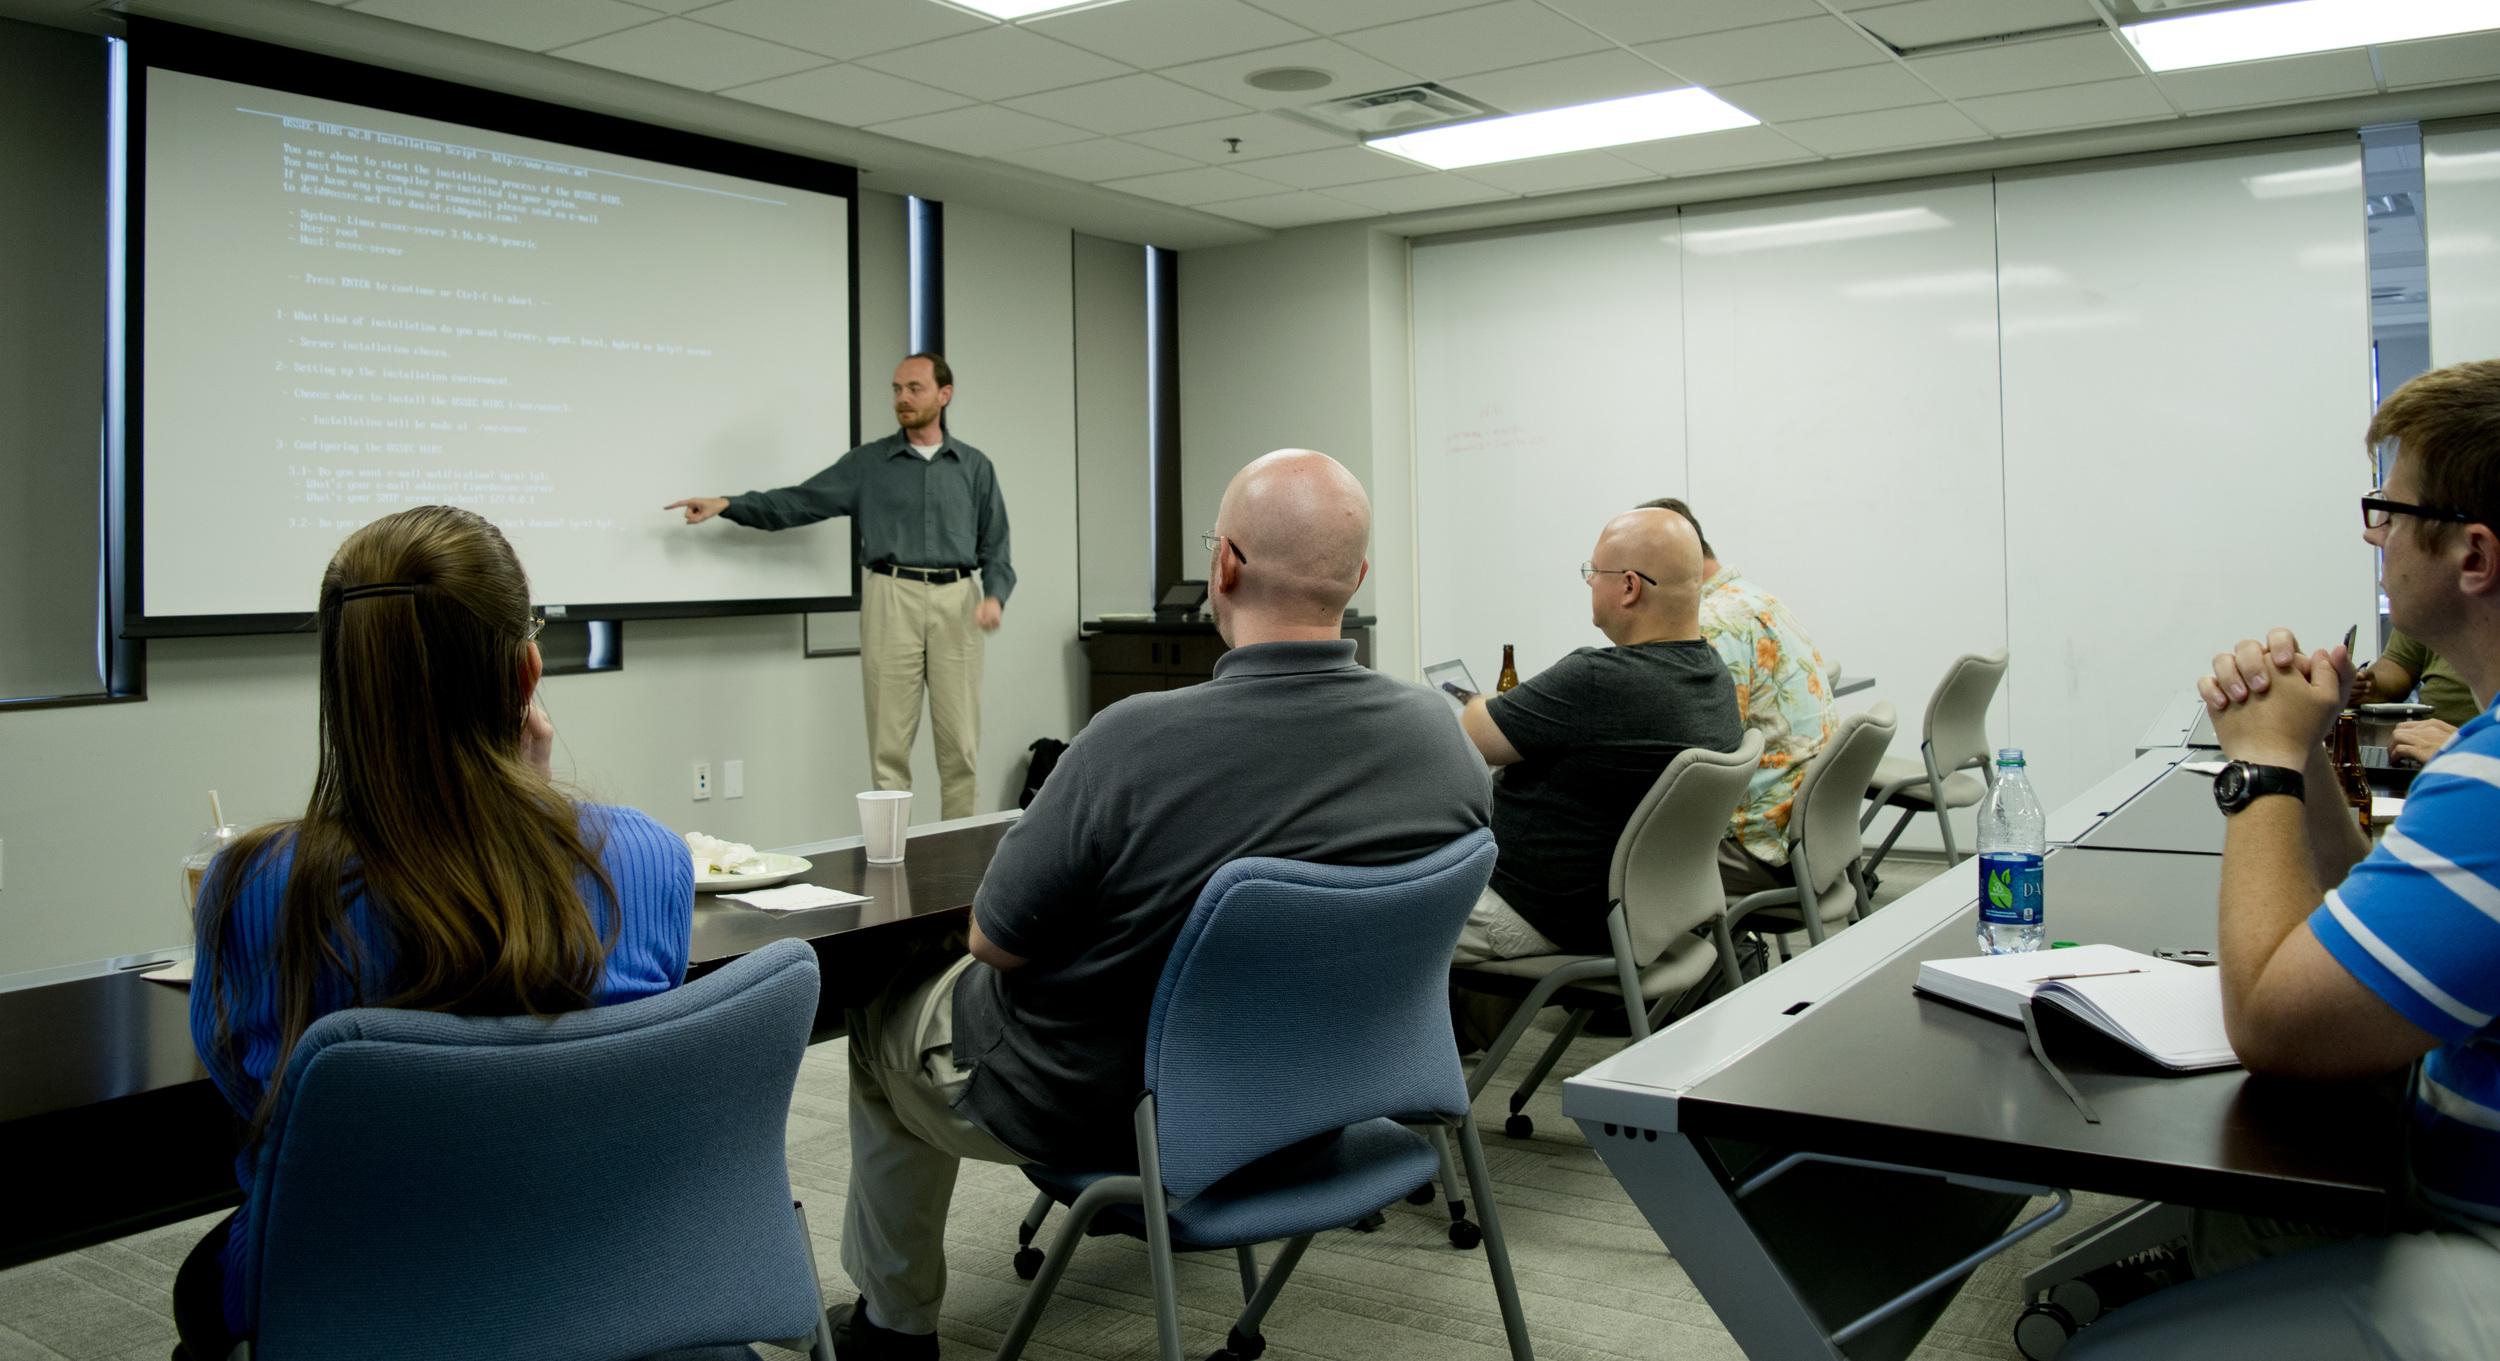 Robert presenting on OSSEC